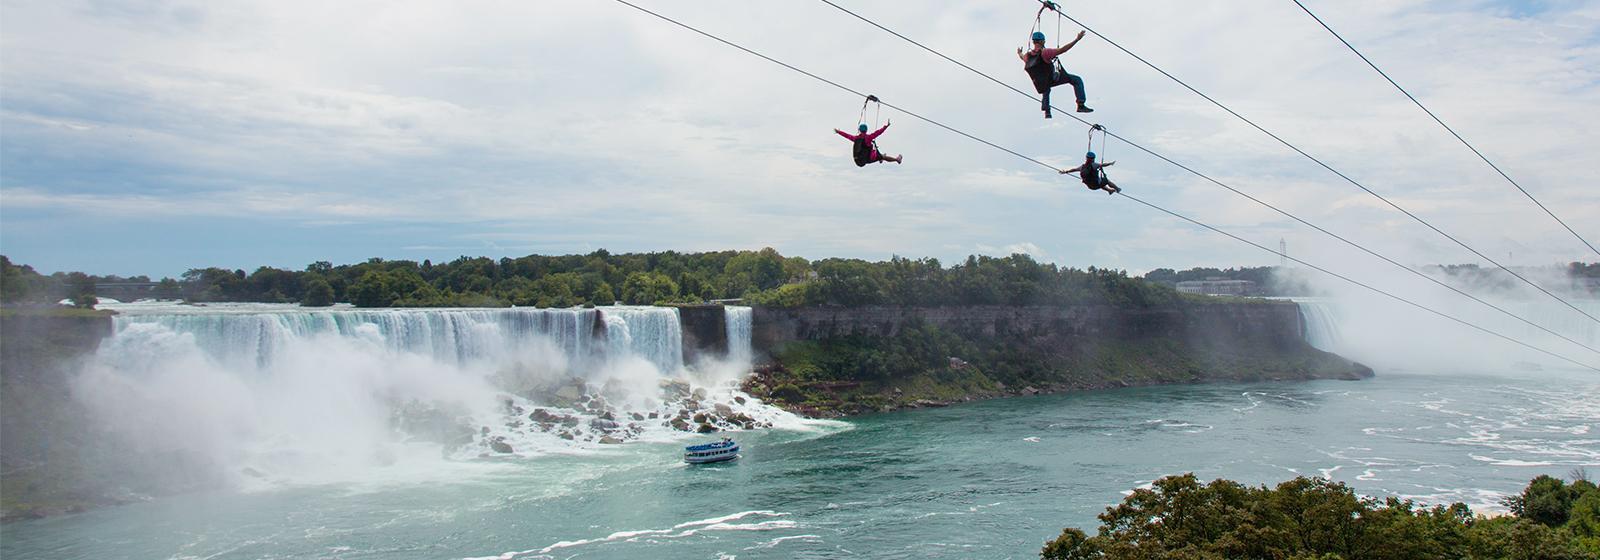 Choses à faire à Chutes du Niagara et environs